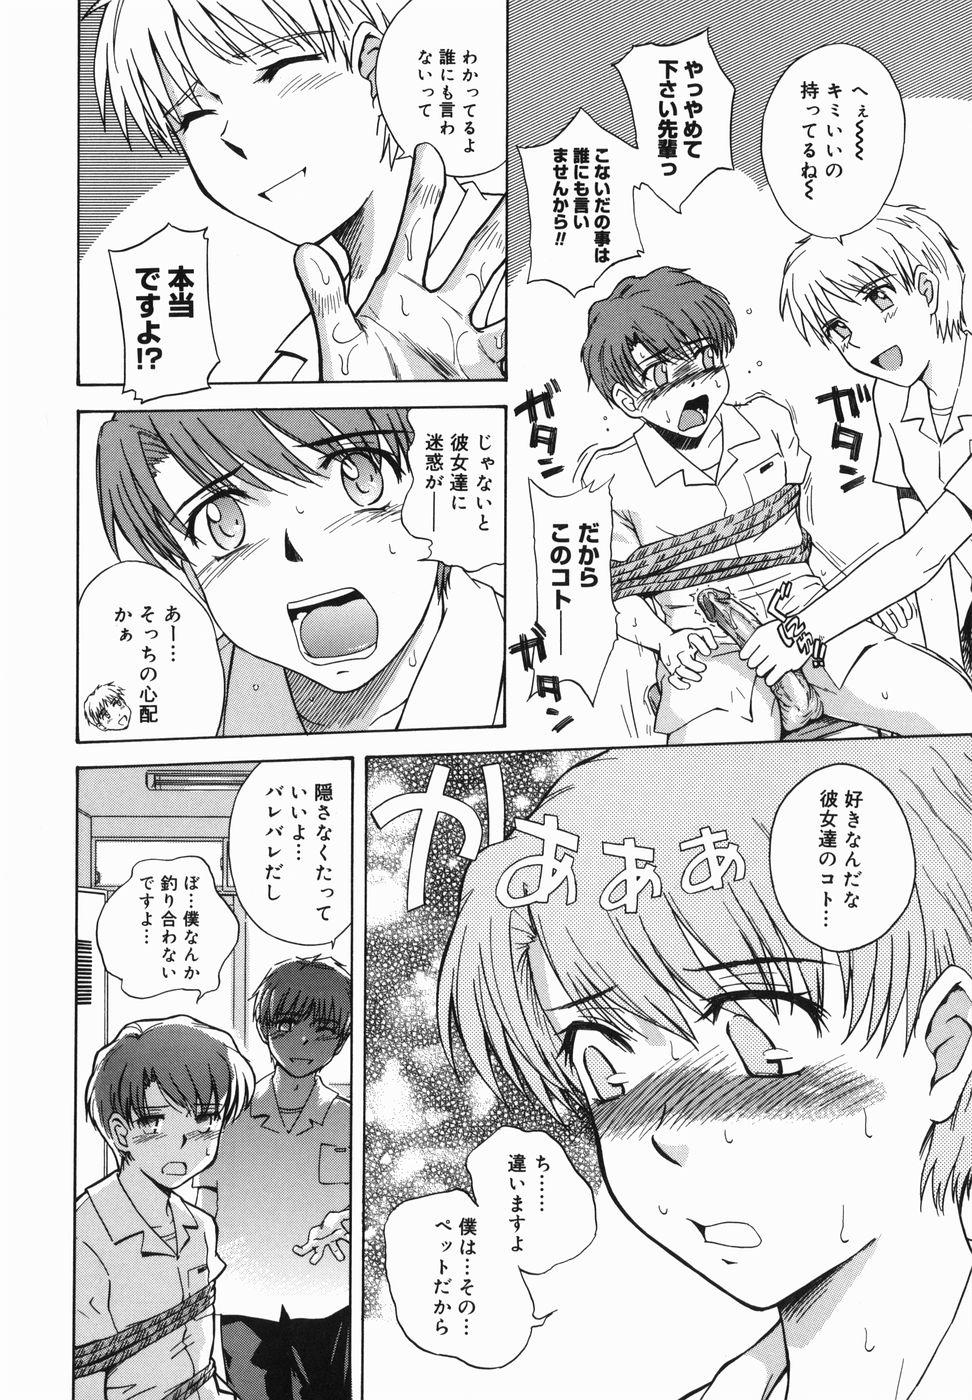 ♭38℃ Loveberry Twins 15